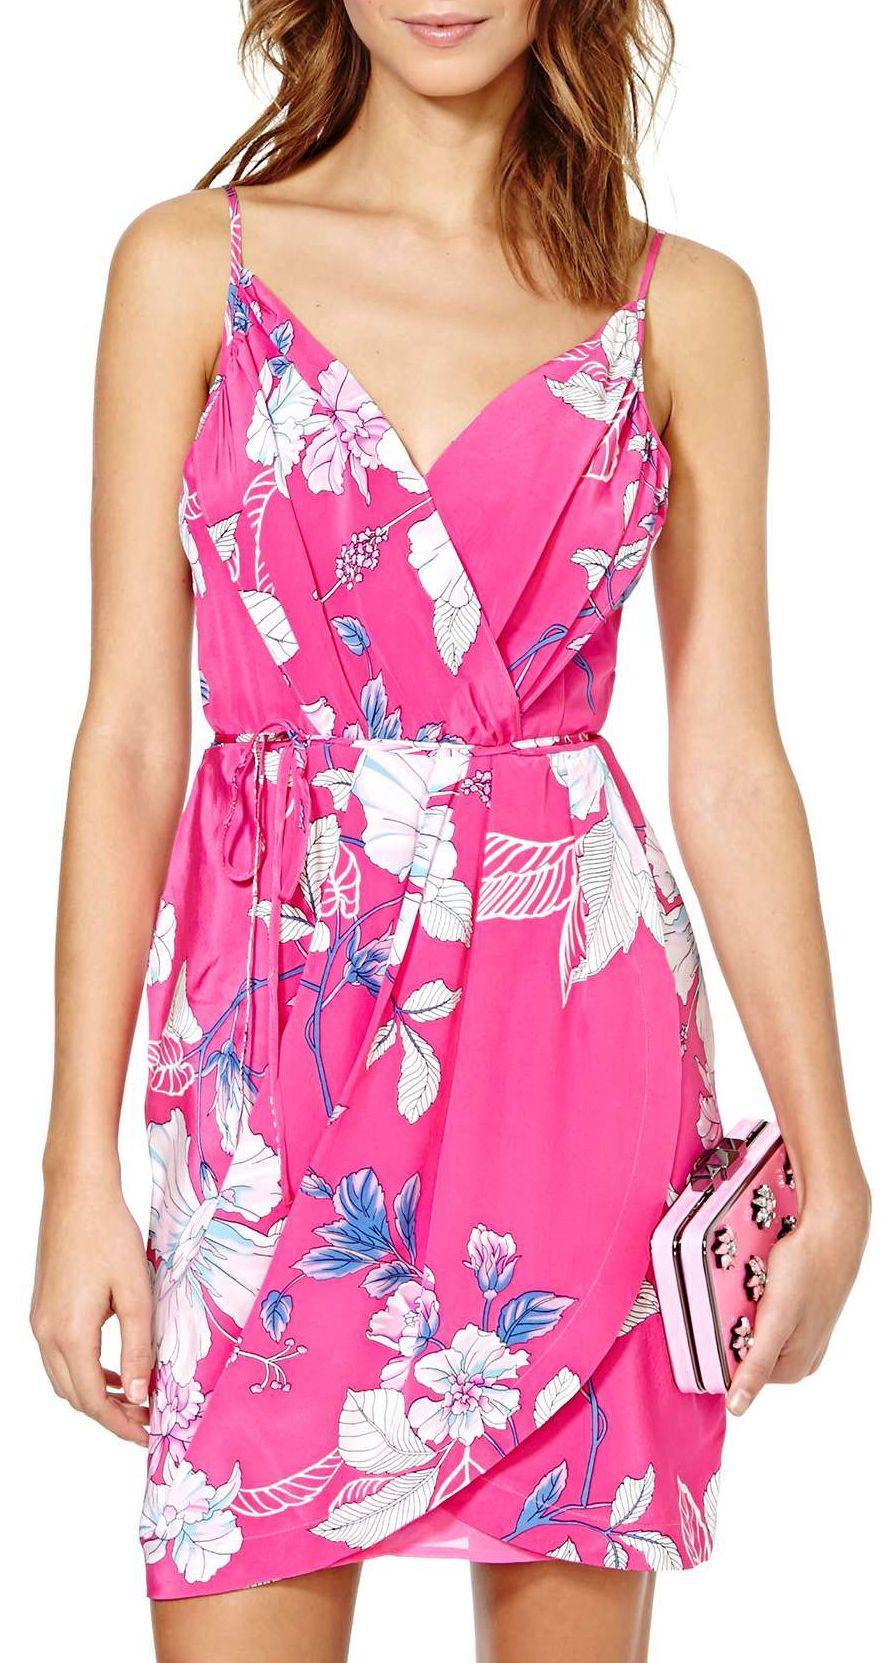 Floral wrap dress | Love the looks | Pinterest | Bodas en la playa ...